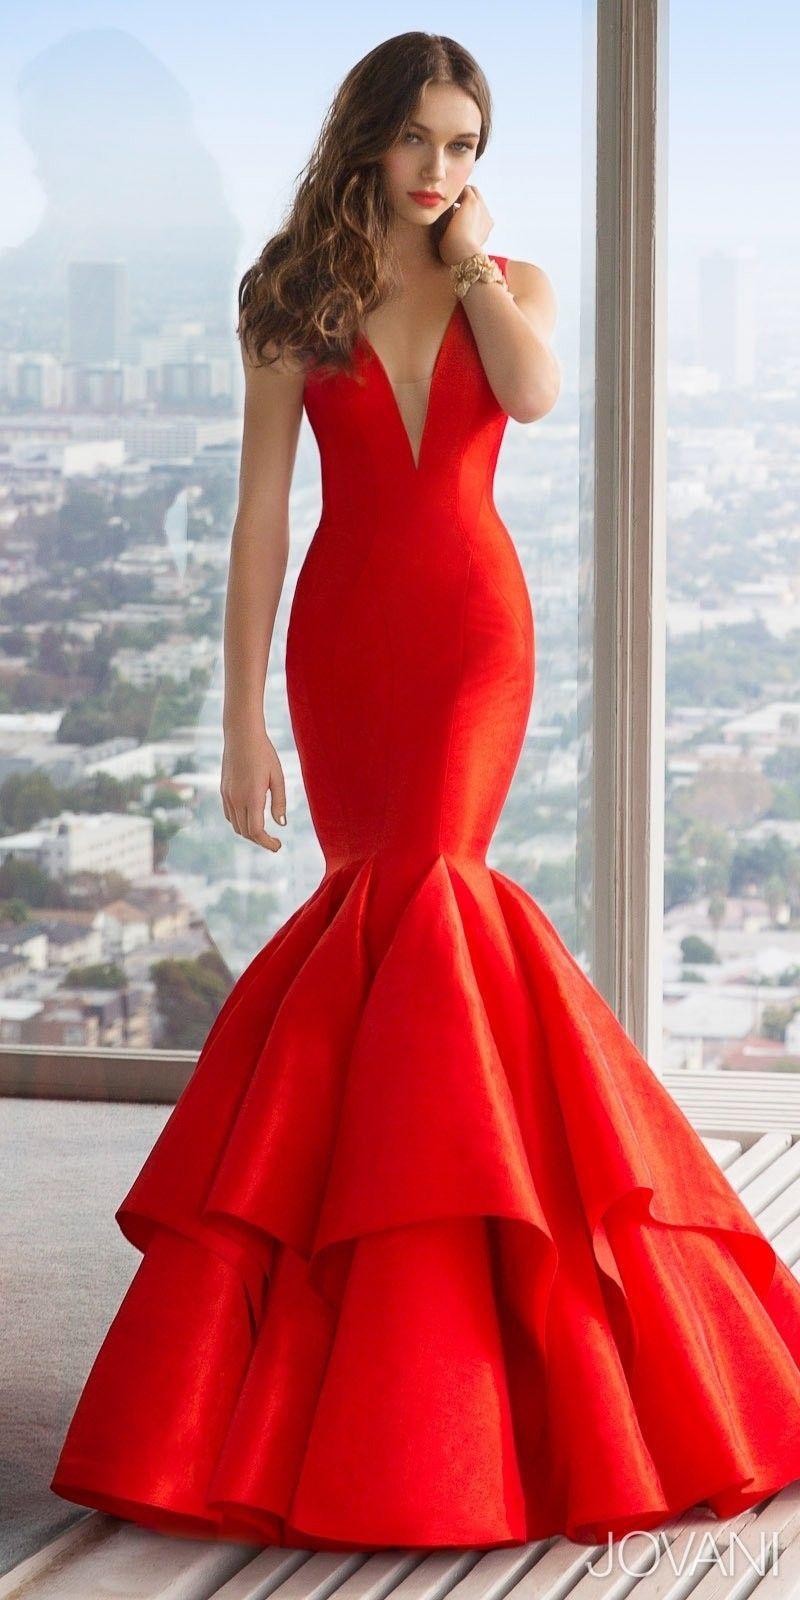 1c9b585709f0b Red fish tail dress. | FAIRYTALE: CLOTHES | Dresses, Prom dresses ...